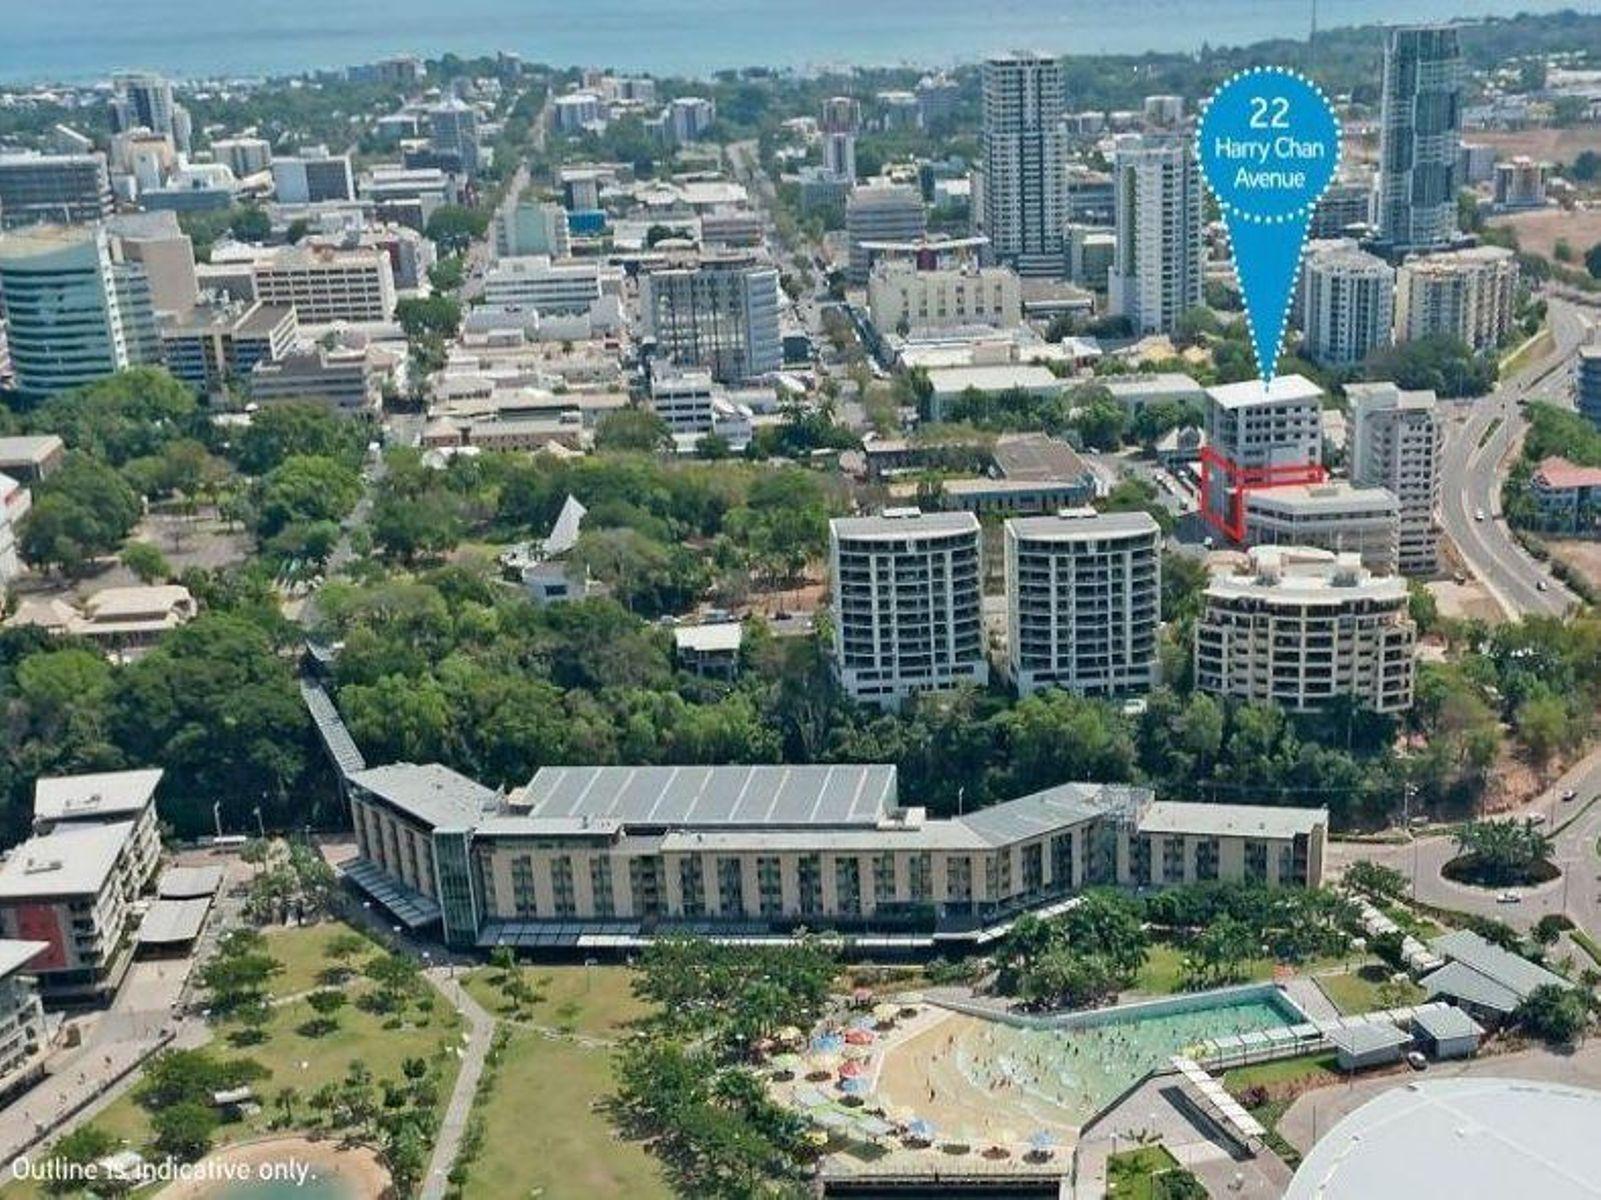 22 Harry Chan Avenue, Darwin City, NT 0800